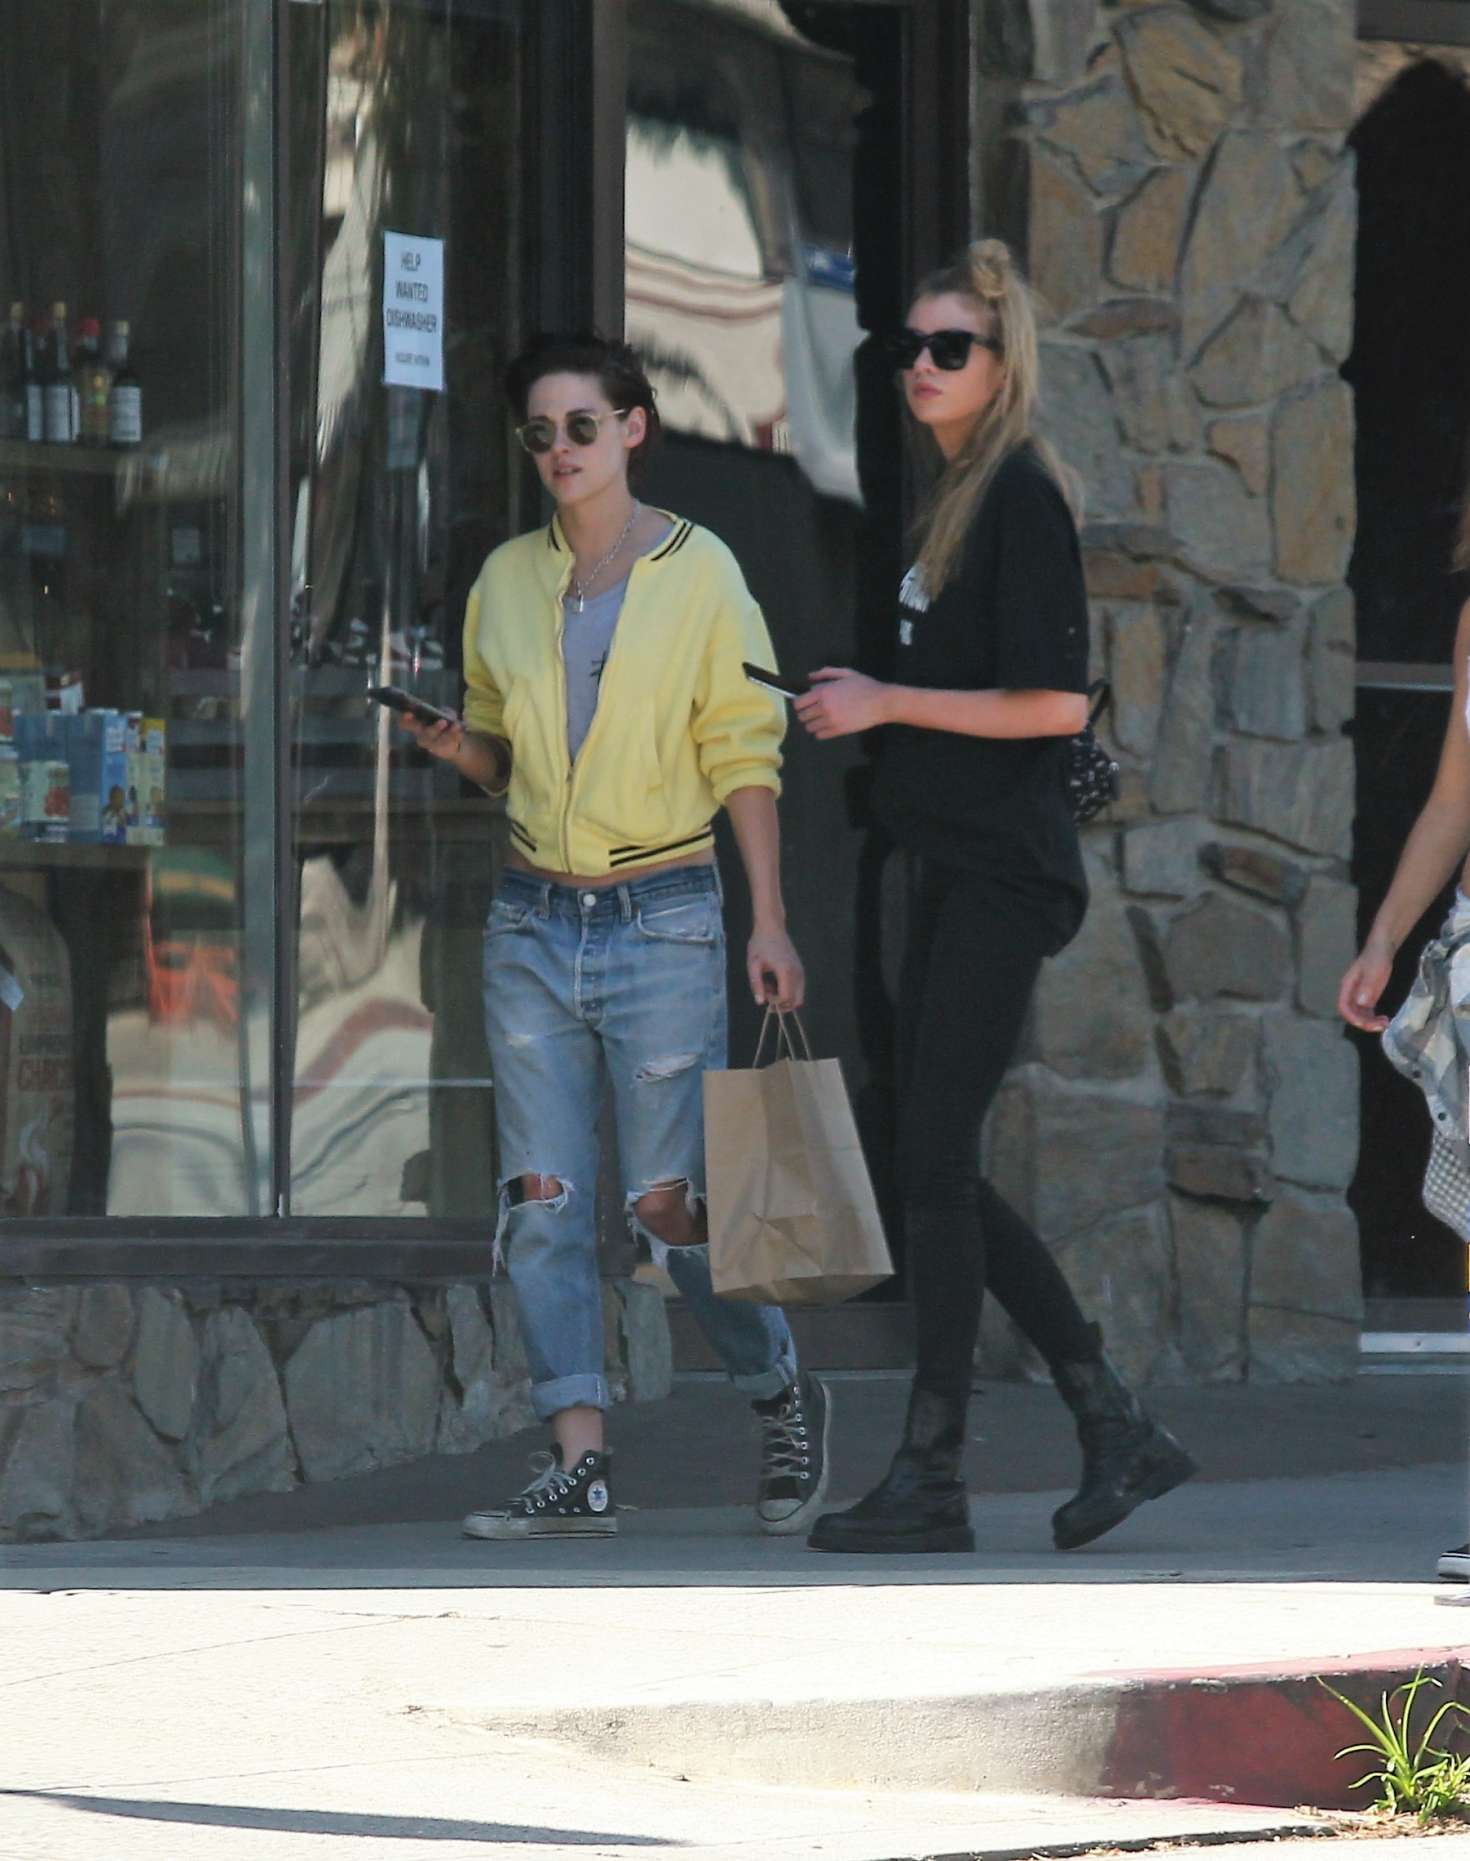 Kristen-Stewart-and-Stella-Maxwell-Out-i